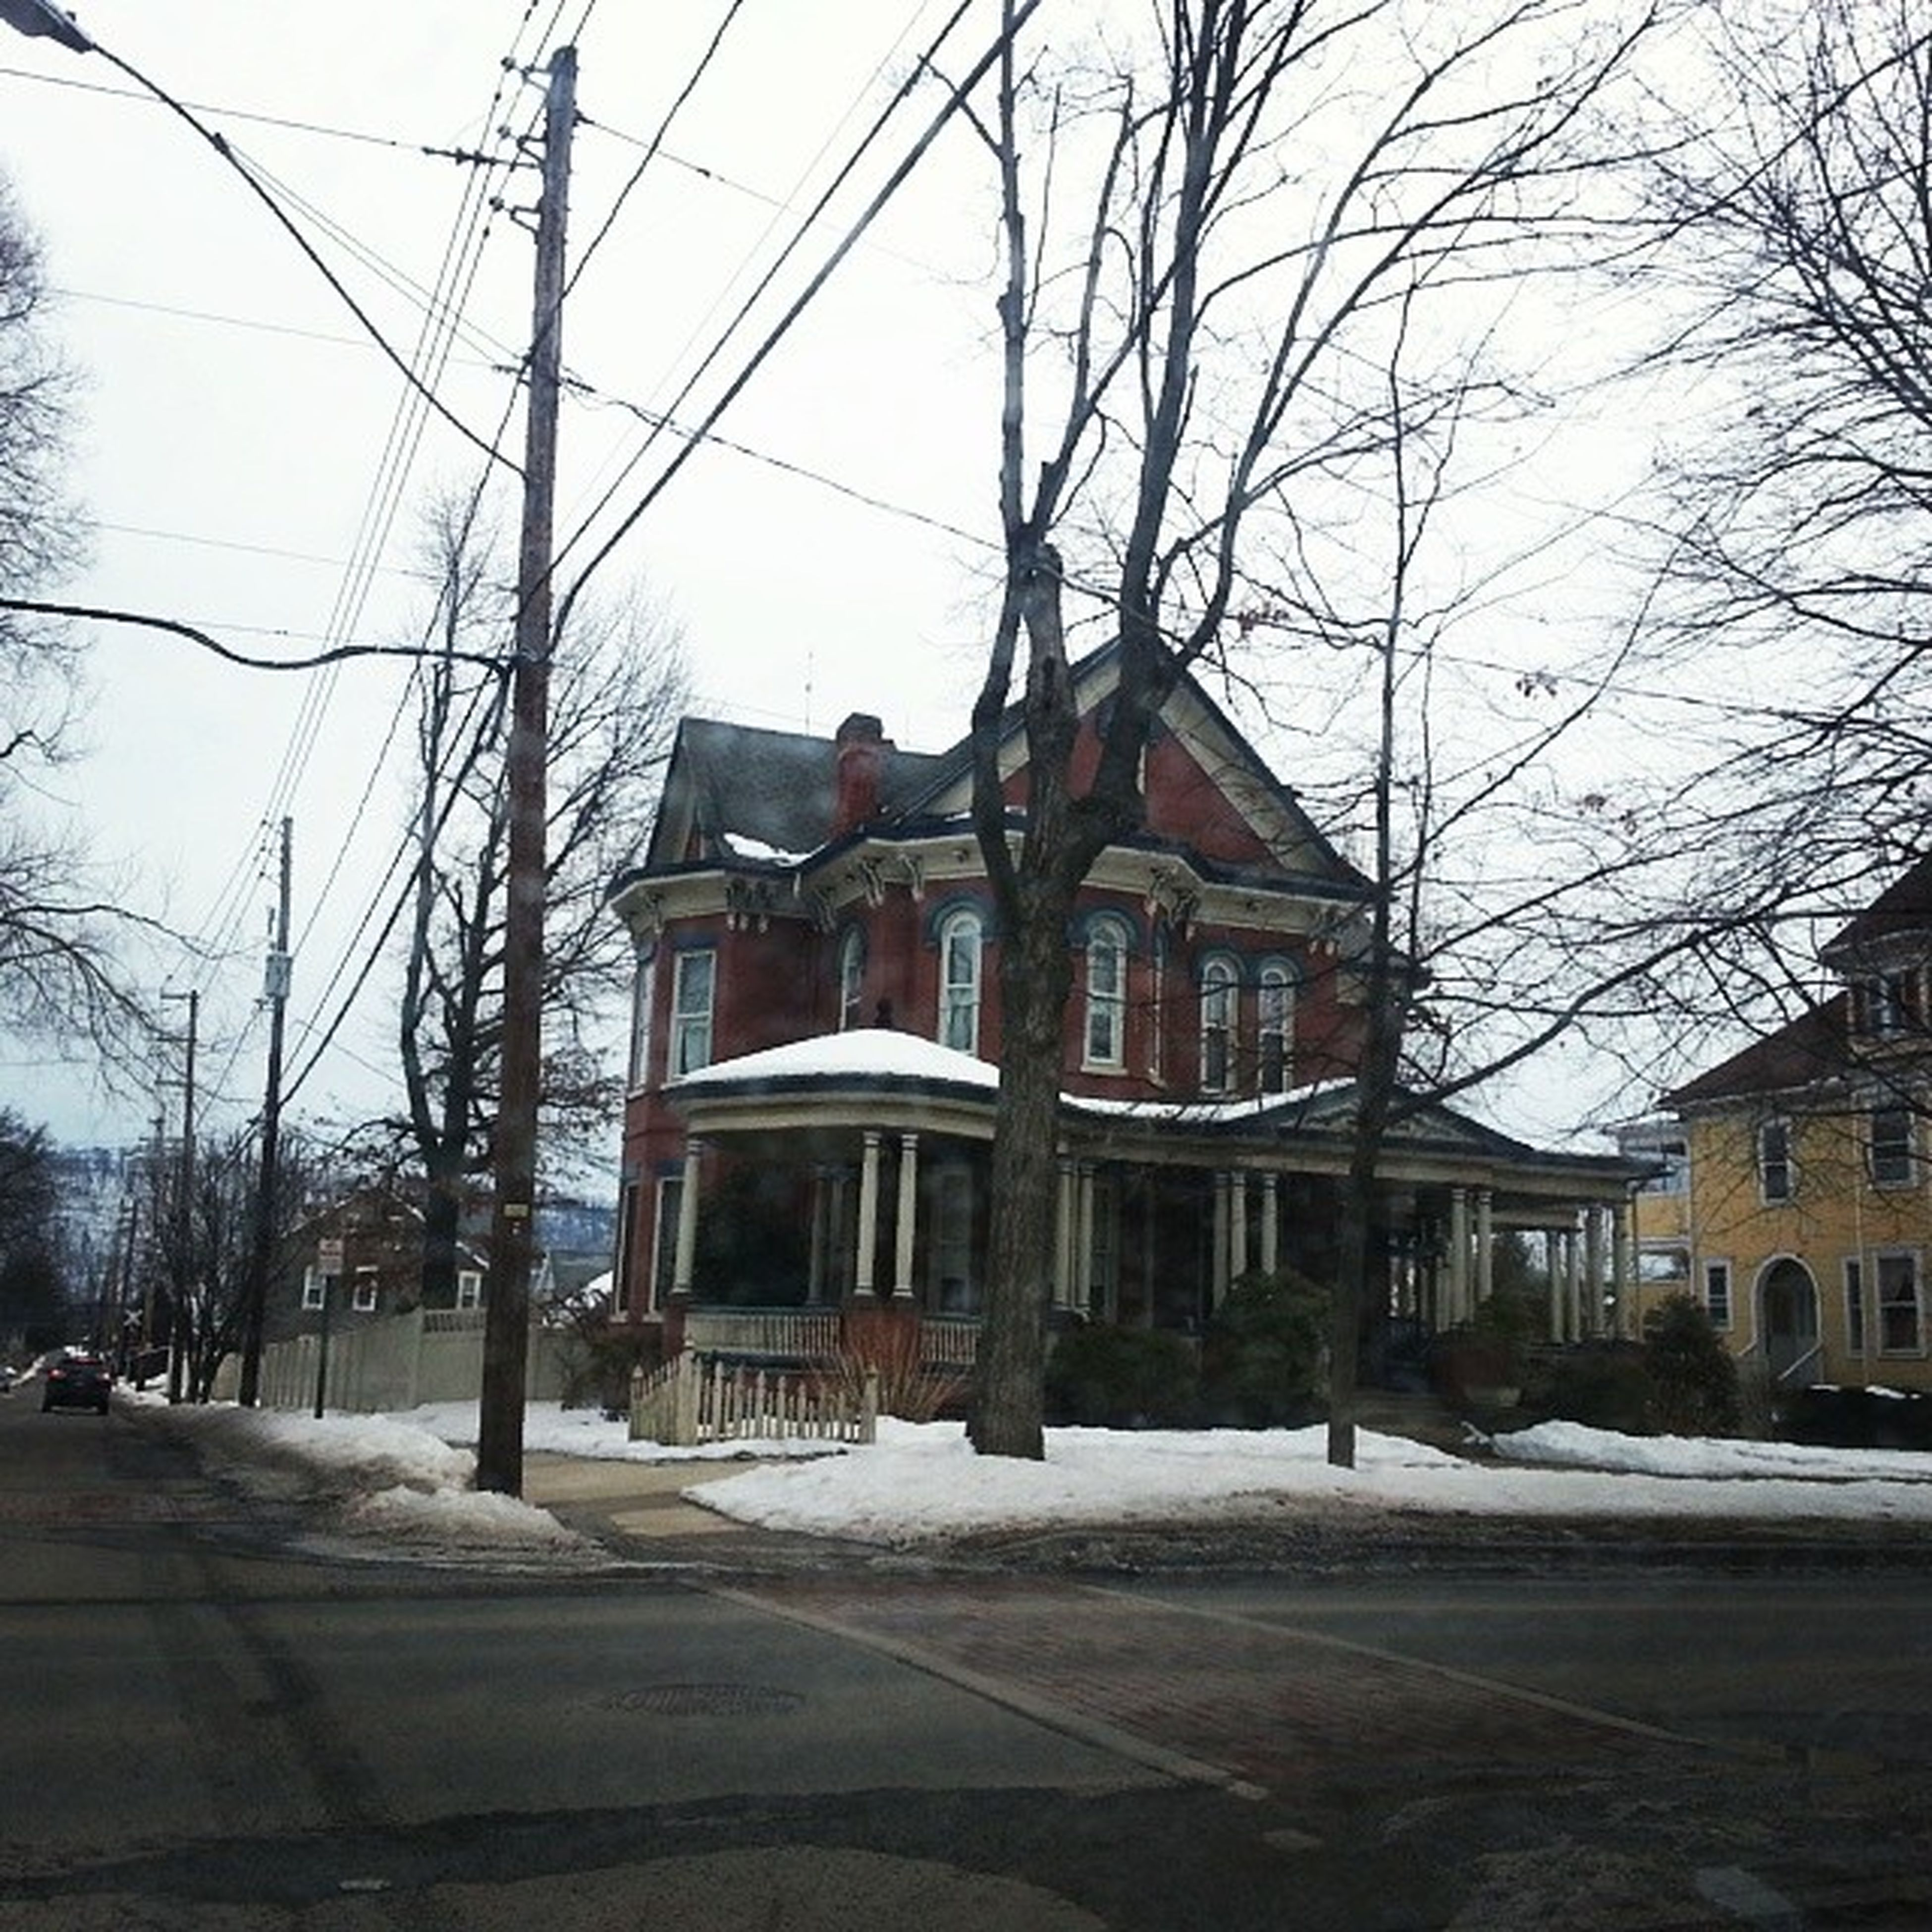 Red house Victorian Mansion Ironstreet Bloomsburg Pennsylvania street overcast